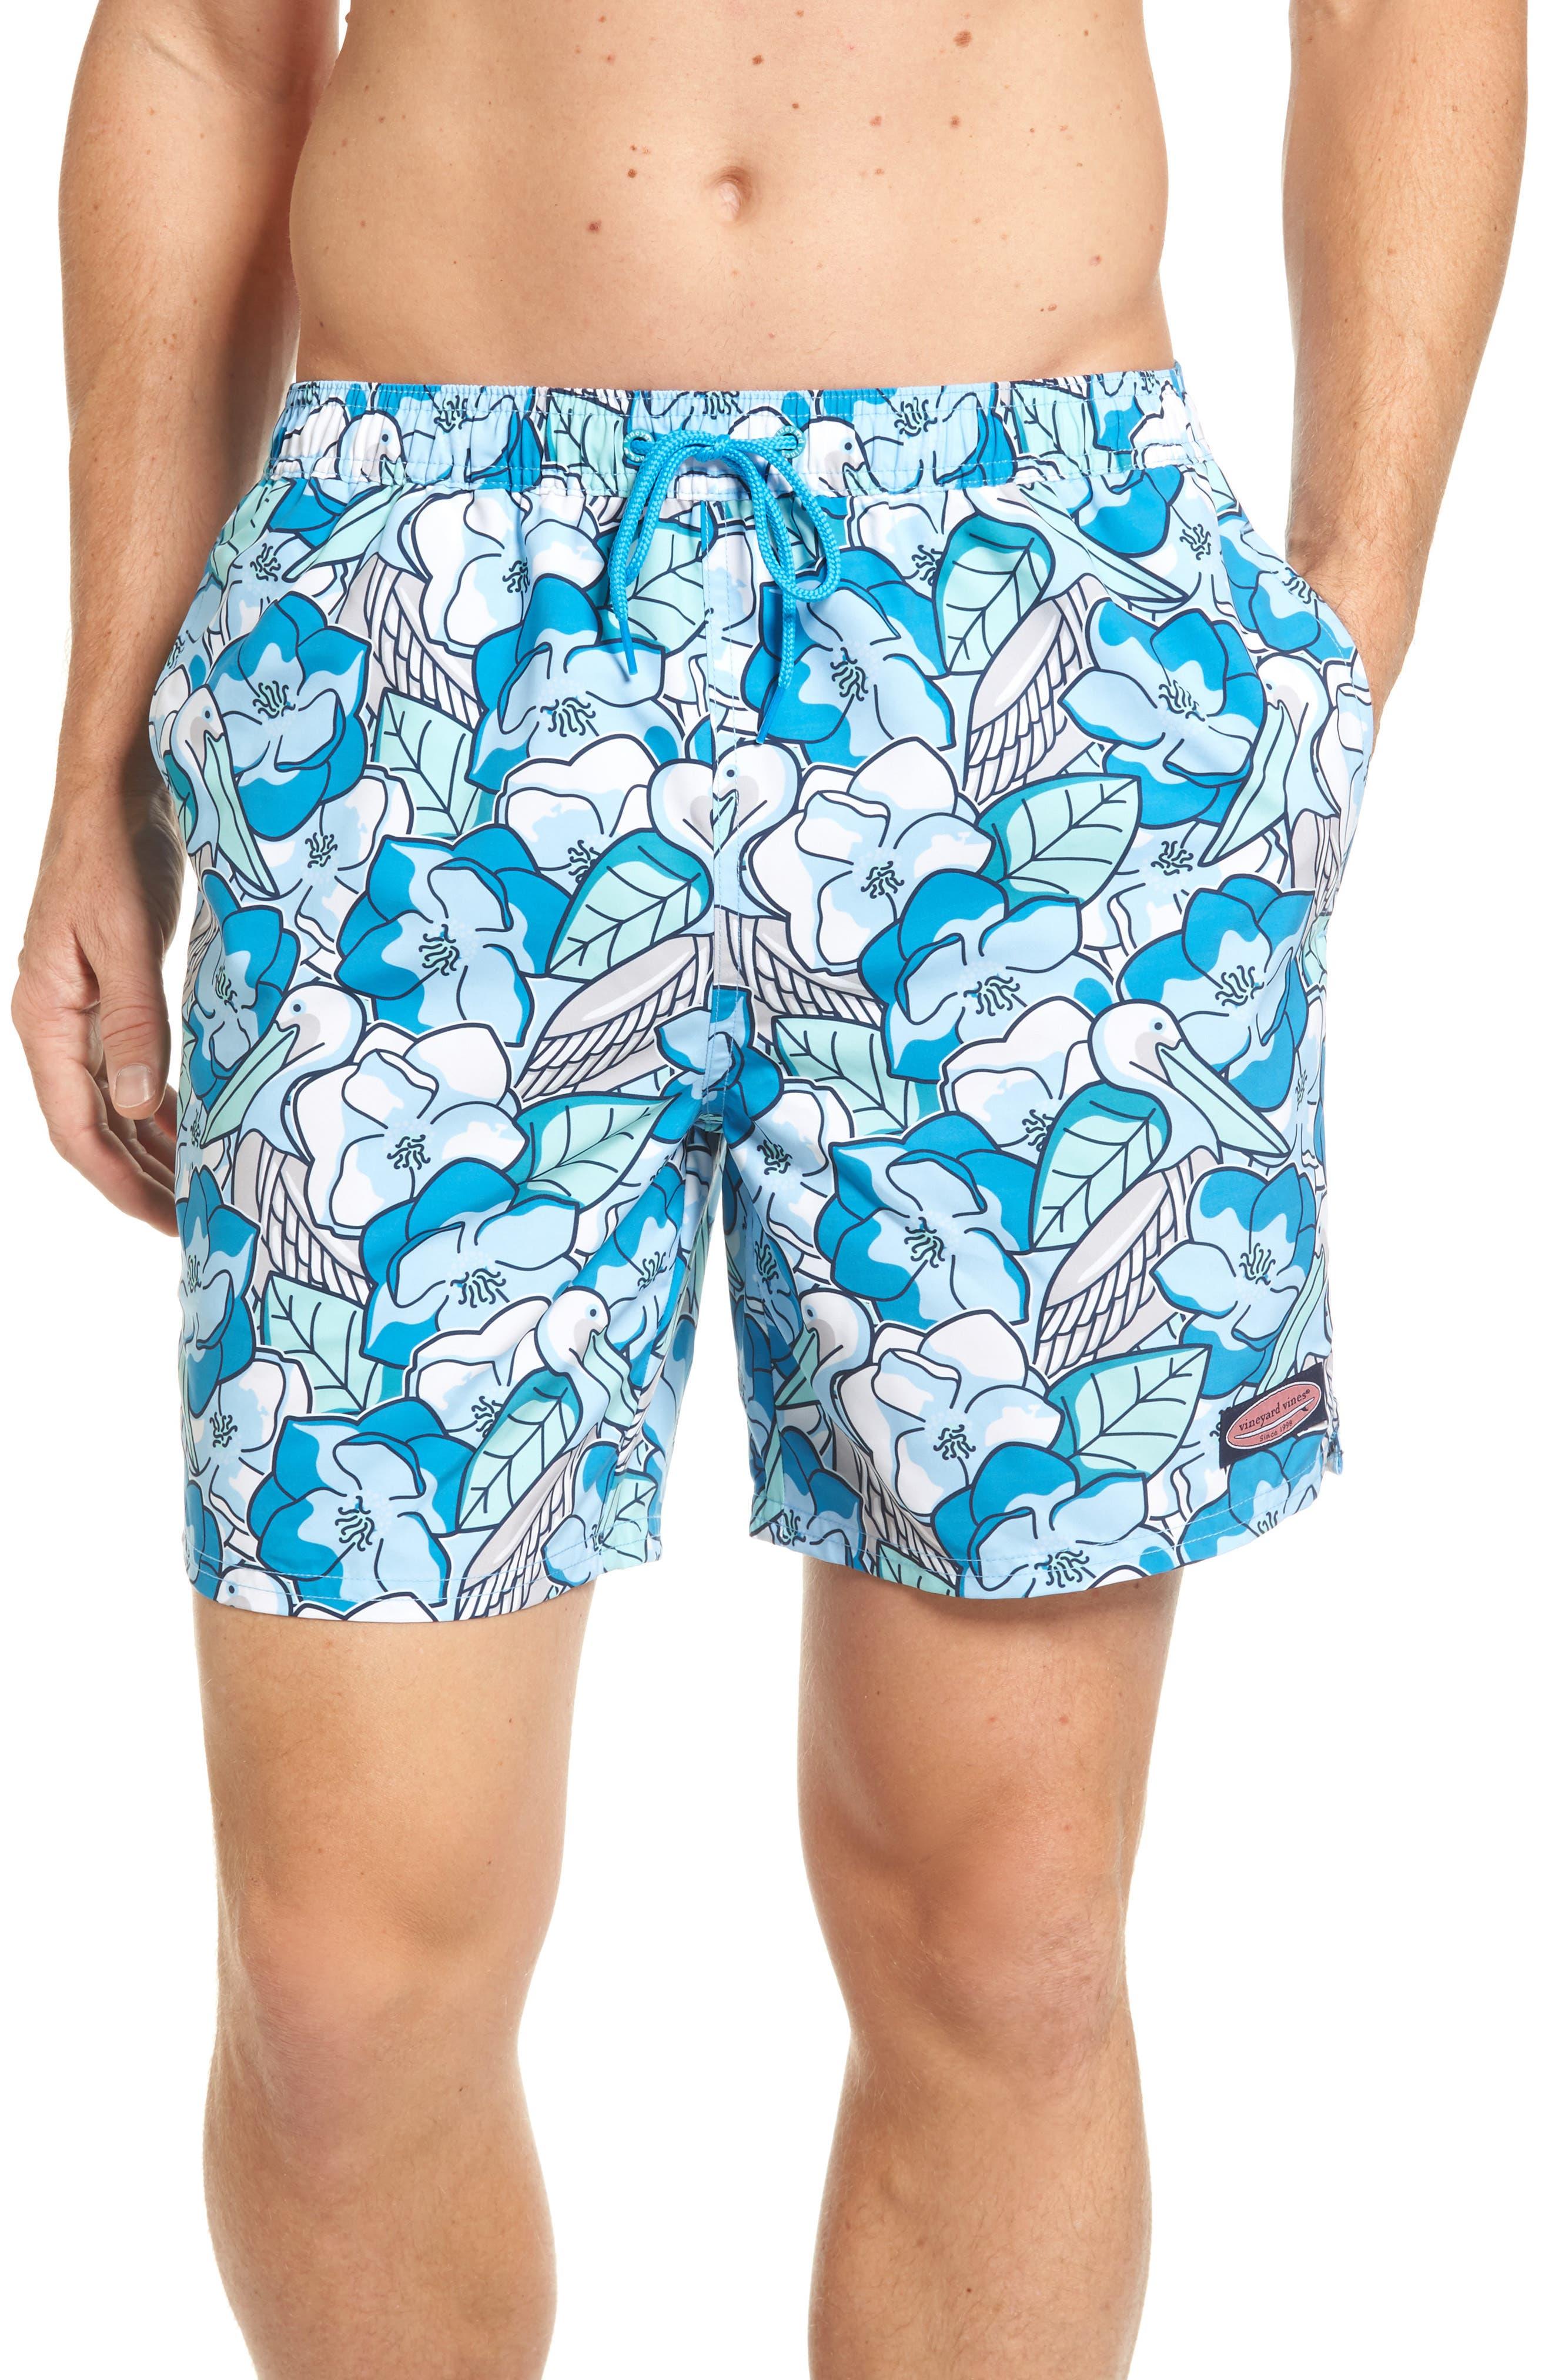 Pelican Magnolias Chappy Swim Trunks,                             Main thumbnail 1, color,                             Airy Blue